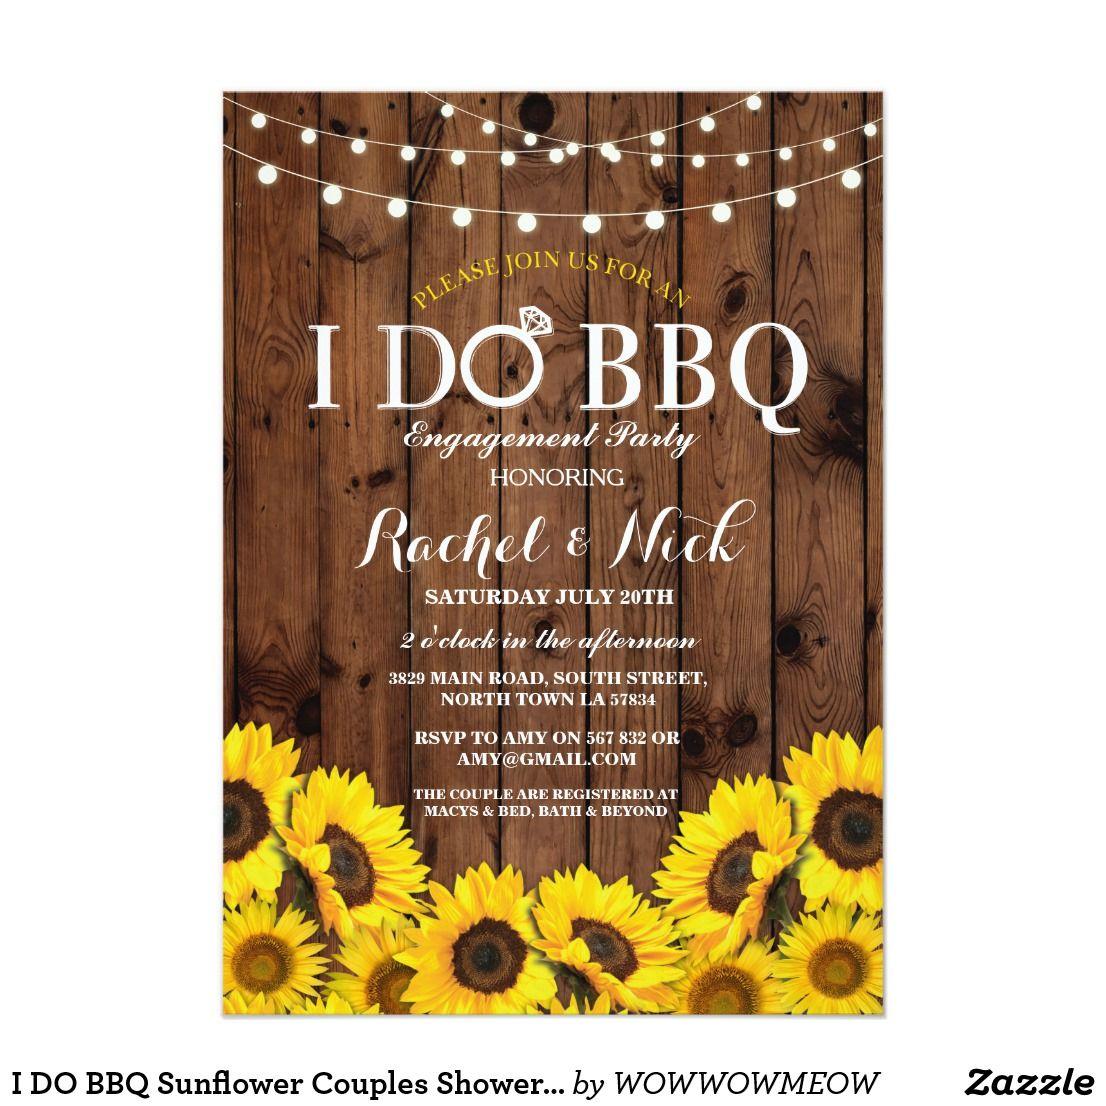 I DO BBQ Sunflower Couples Shower Rustic Invite | Couple shower ...